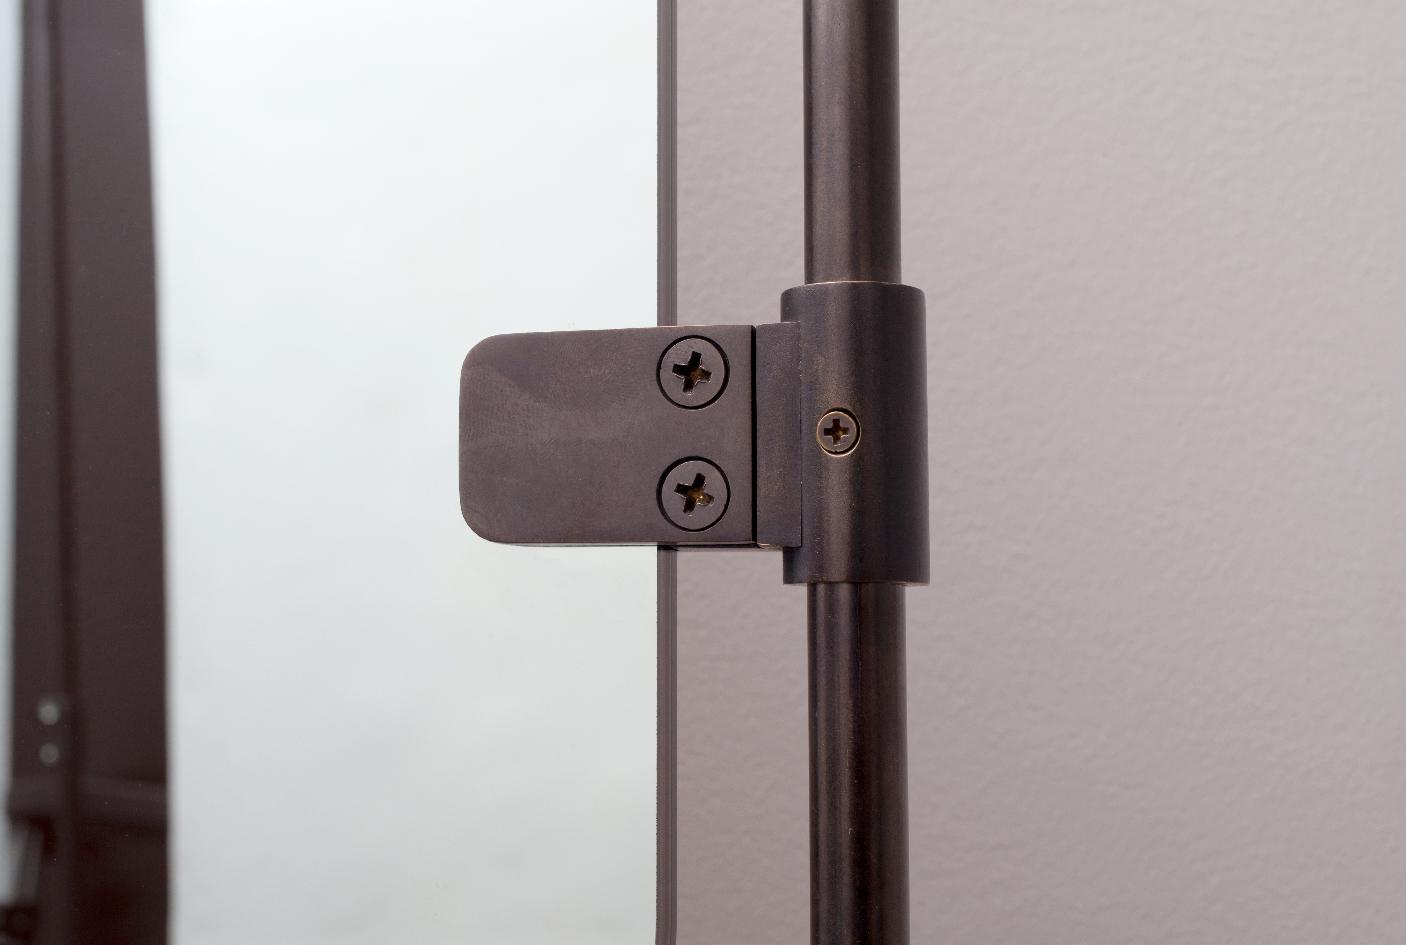 SwitchMirror_Comp6-01.jpg